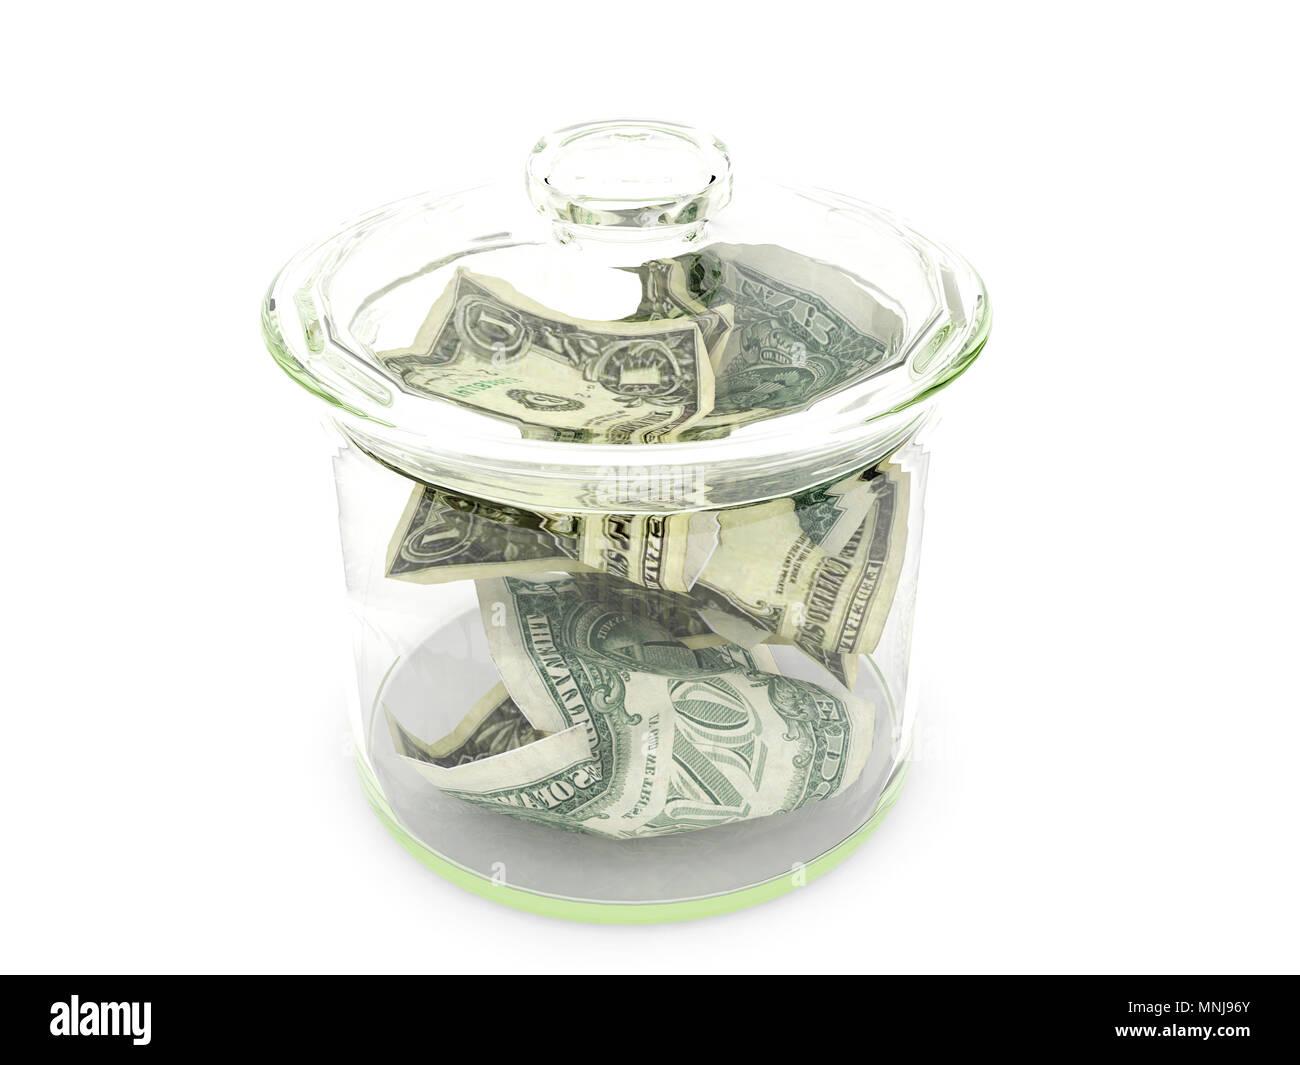 Dollar money in glass bottle isolated on white background, money saving concept - Stock Image